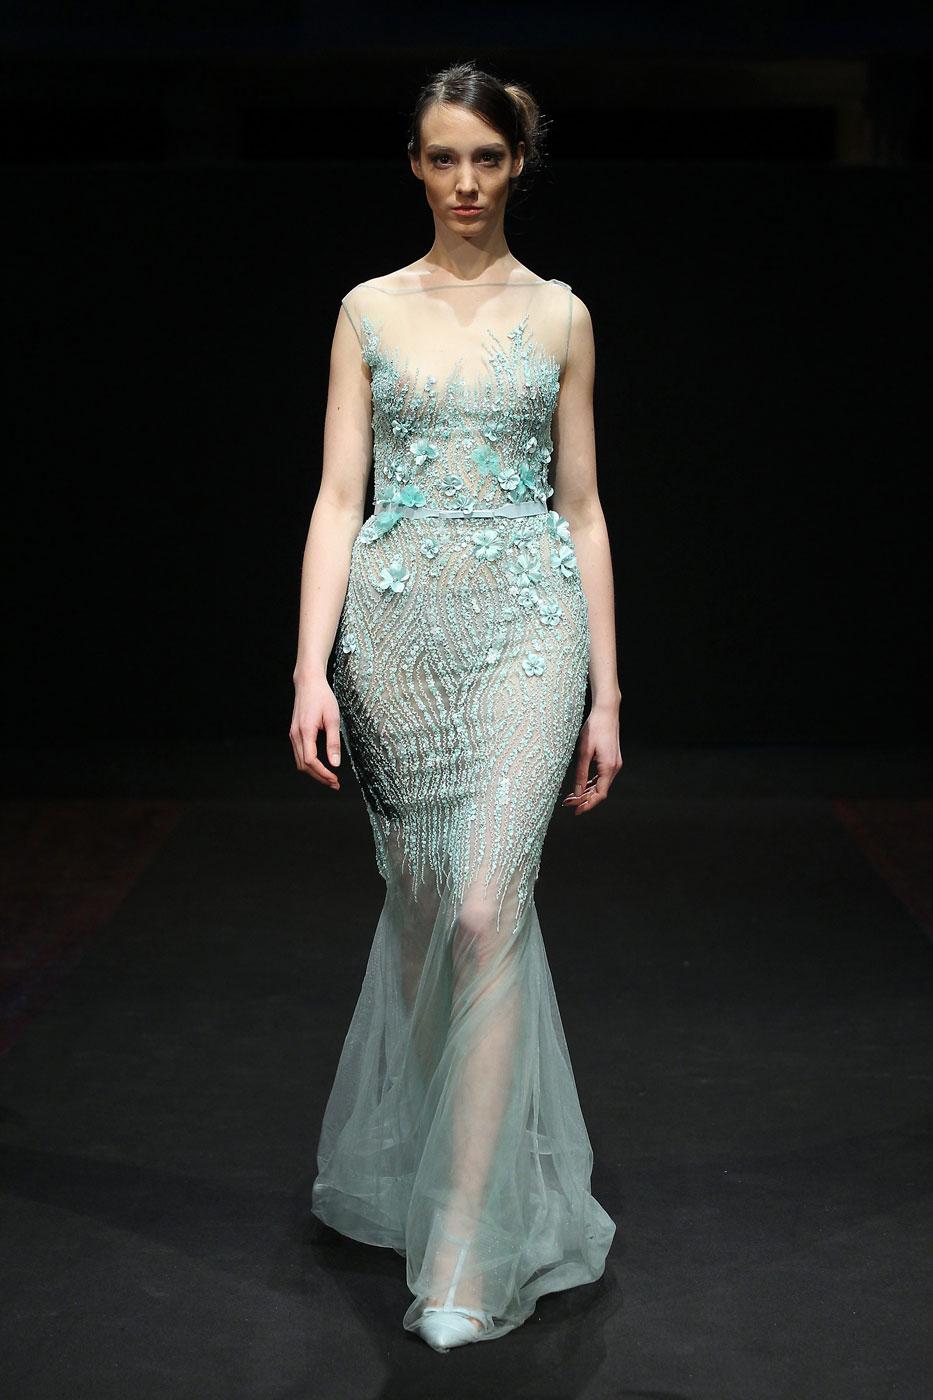 Abed-Mahfouz-fashion-runway-show-haute-couture-paris-spring-2015-the-impression-06